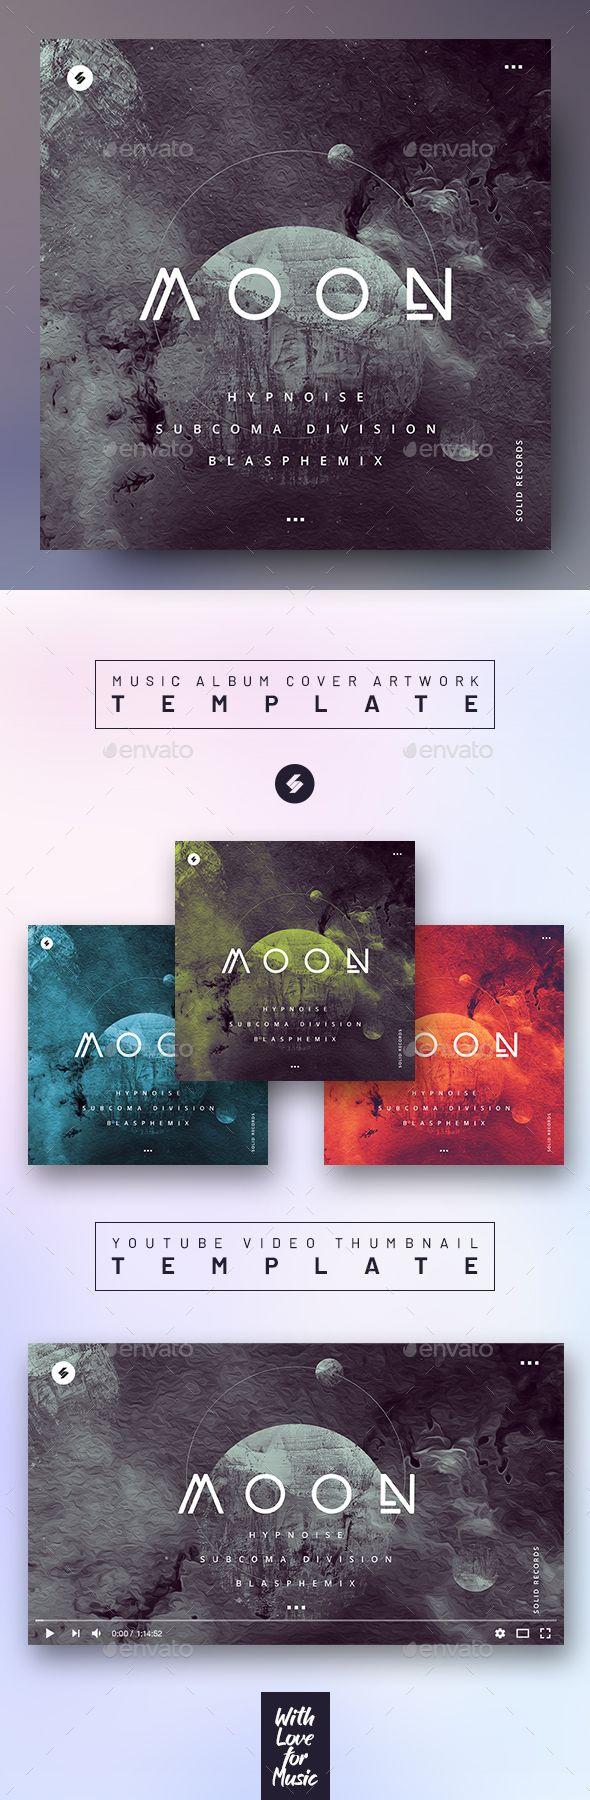 Moon Music Album Cover Artwork Video Thumbnail Template In 2020 Music Album Cover Cover Artwork Album Covers